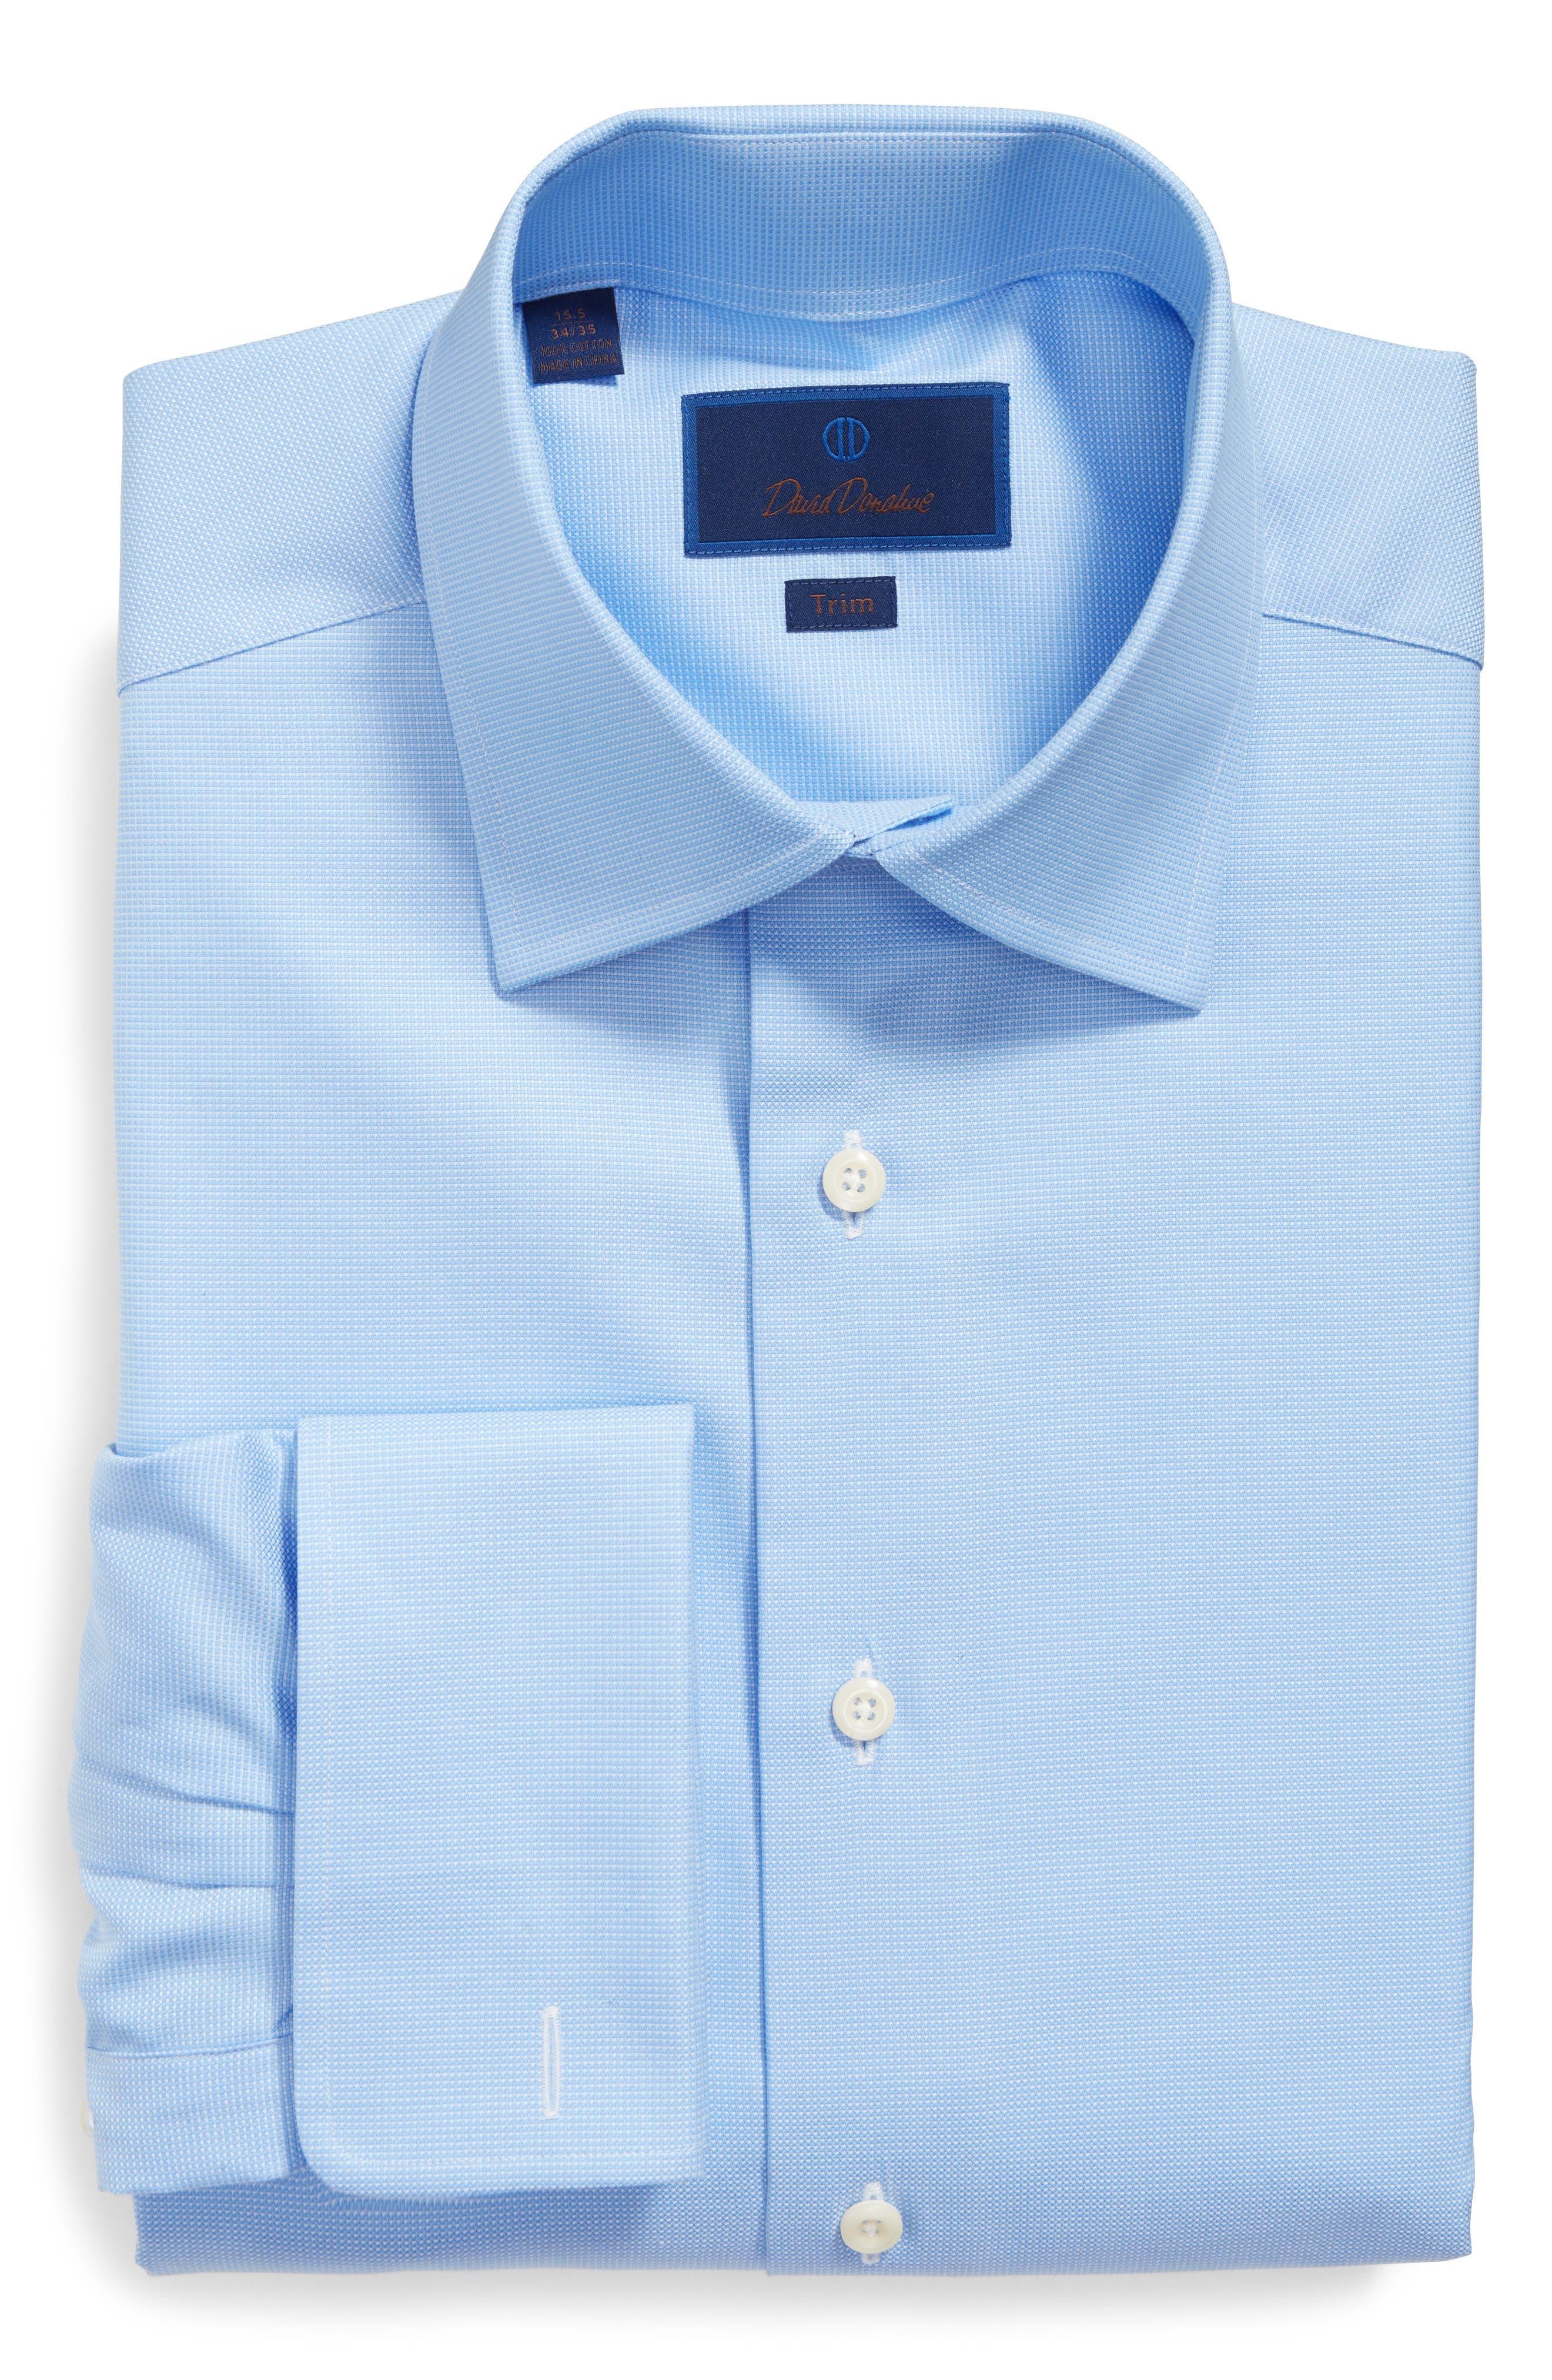 Trim Fit Texture French Cuff Dress Shirt,                             Main thumbnail 1, color,                             BLUE